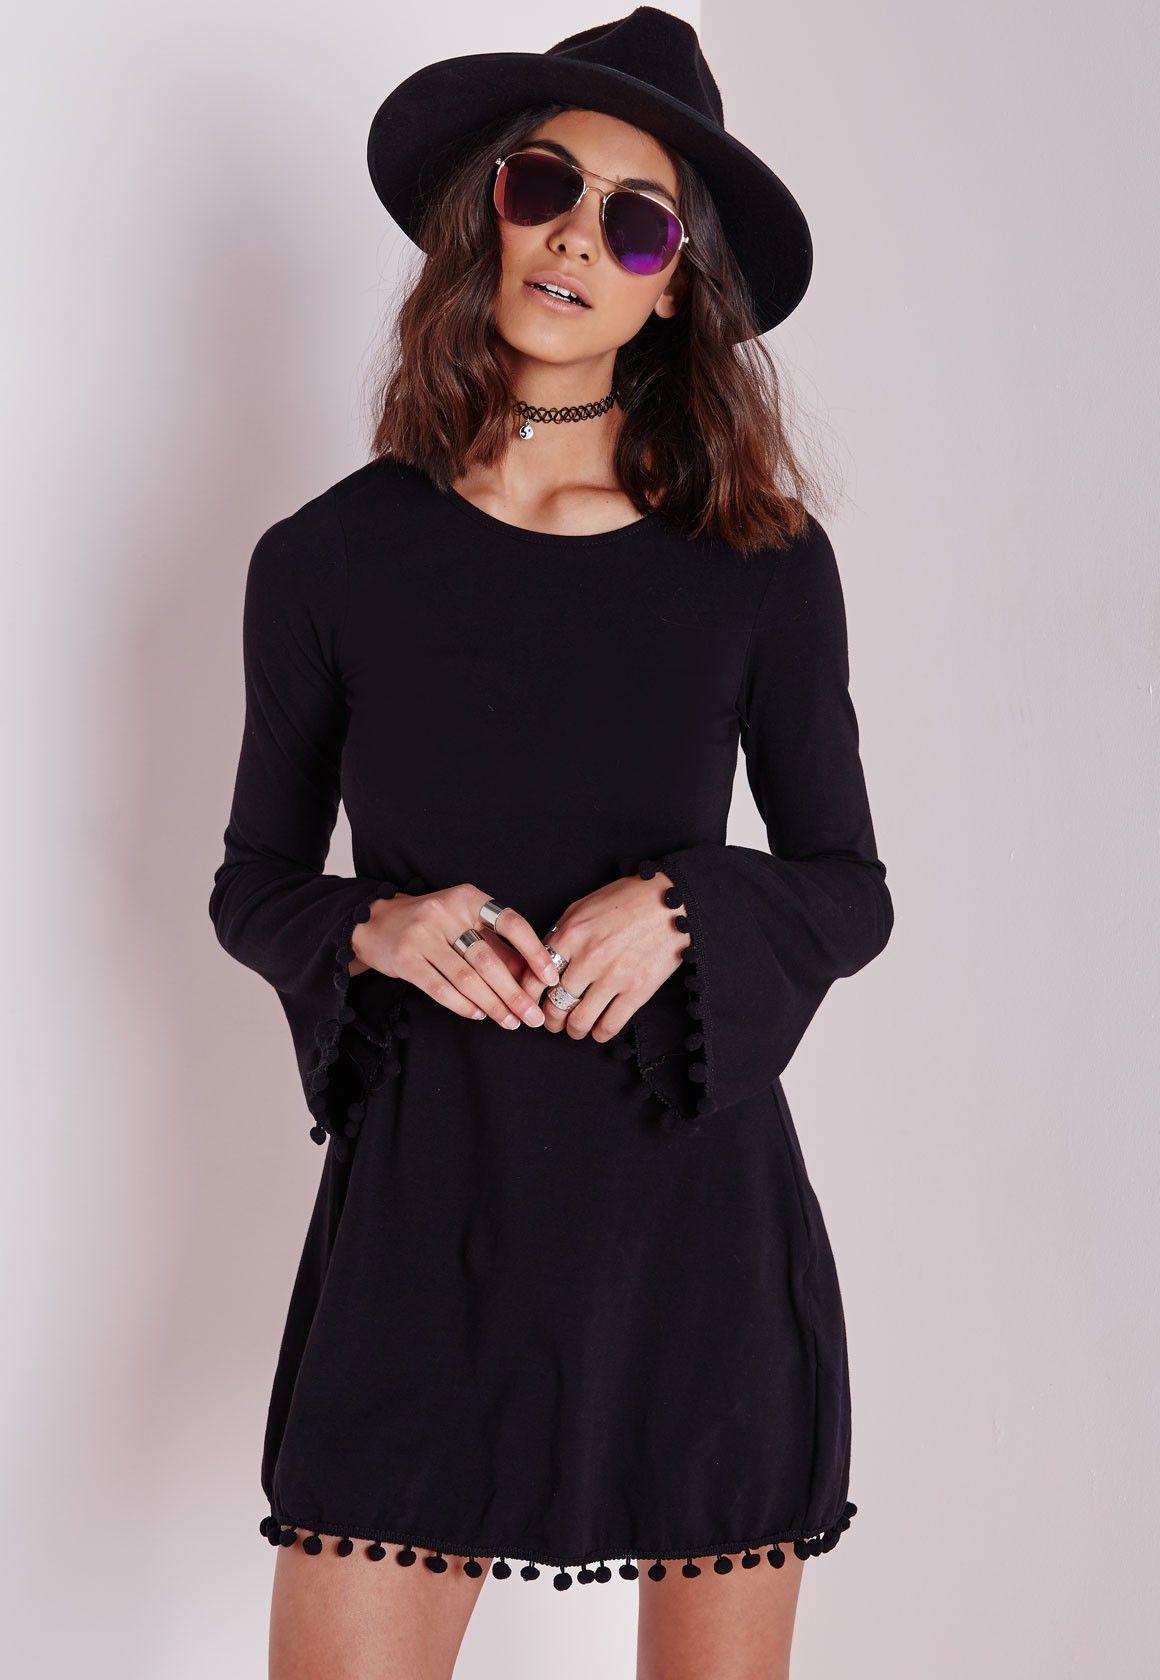 Missguided - Pom Pom Trim Bell Sleeve Swing Dress Black